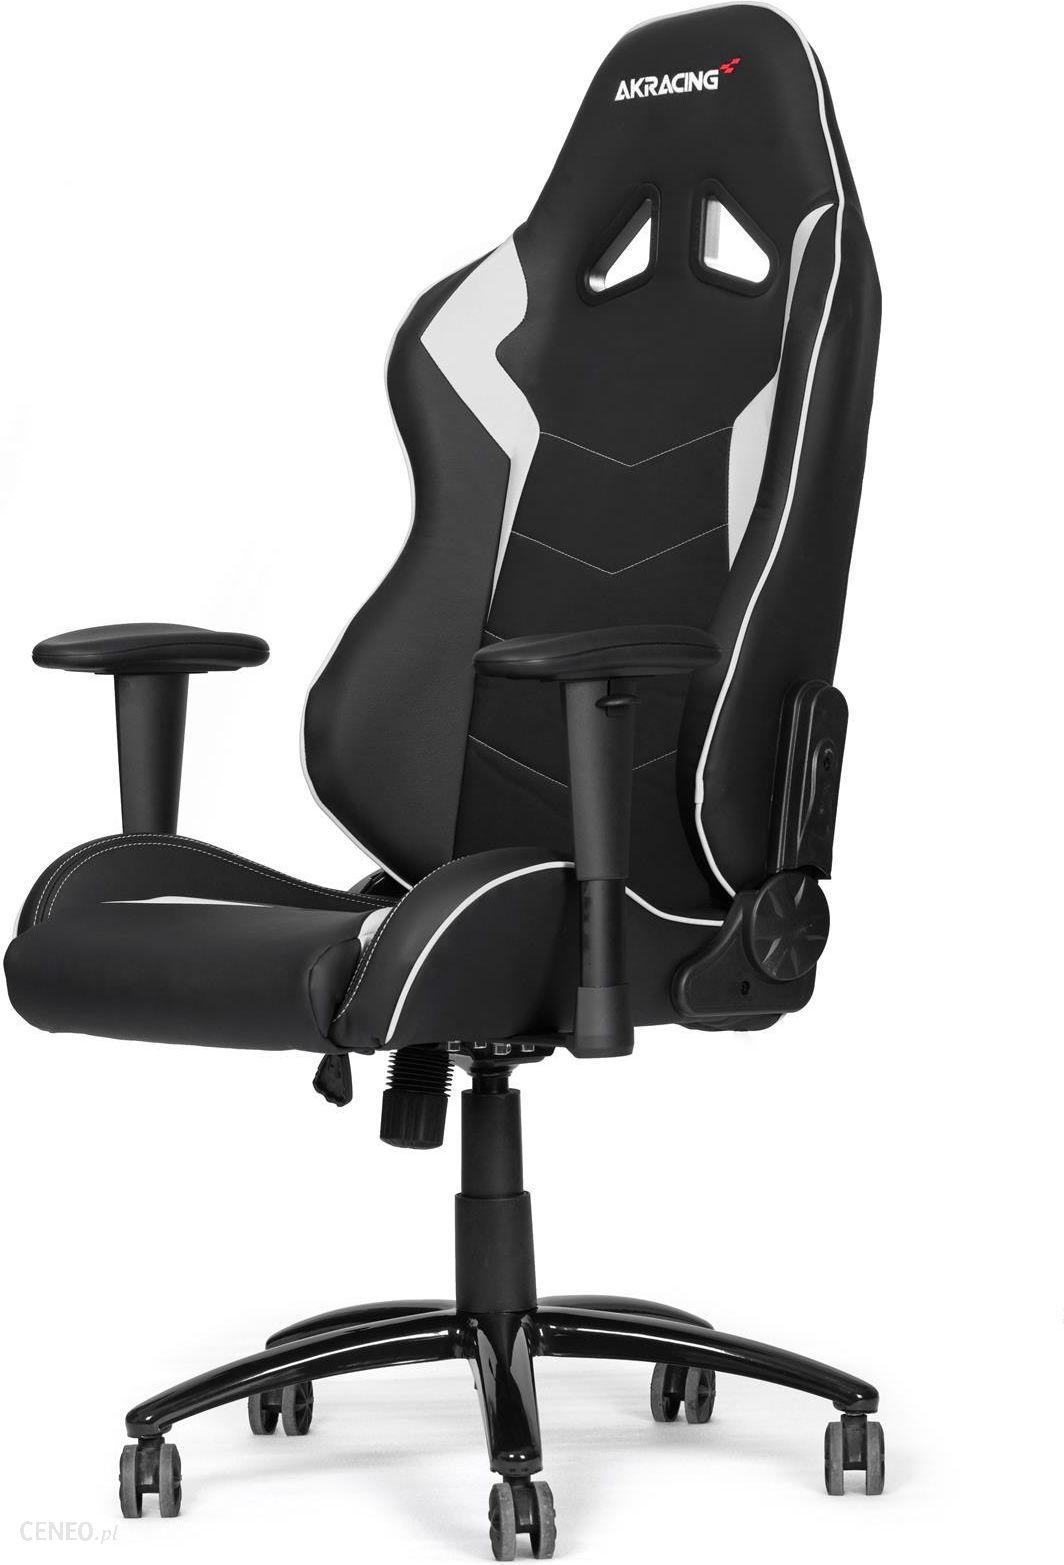 Akracing Octane Gaming Chair Ak Octane Wt zdjęcie 1